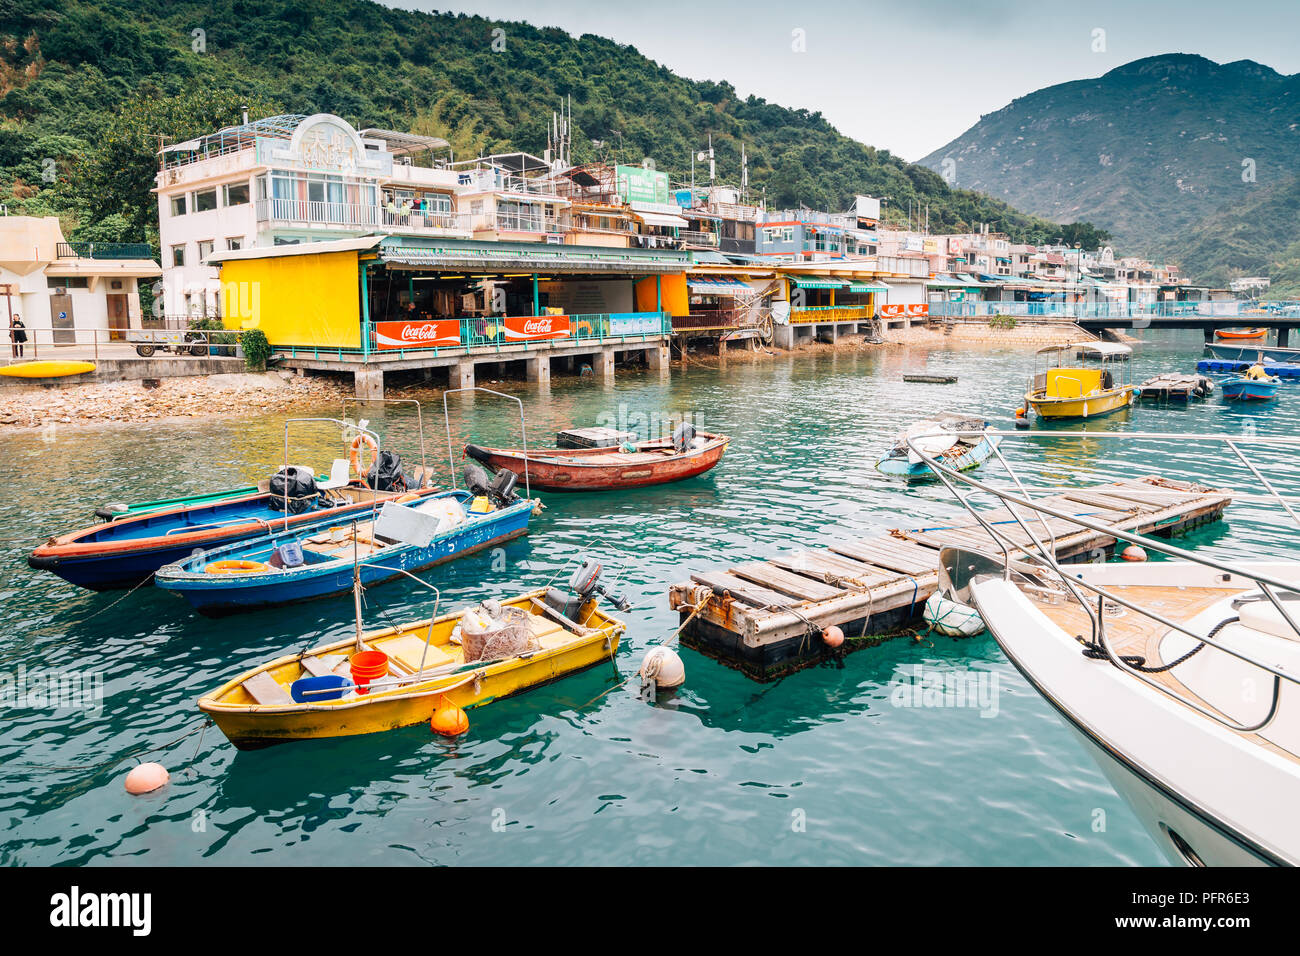 Hong Kong - March 16, 2017 : Lamma island Sok Kwu Wan fishing village harbor view - Stock Image